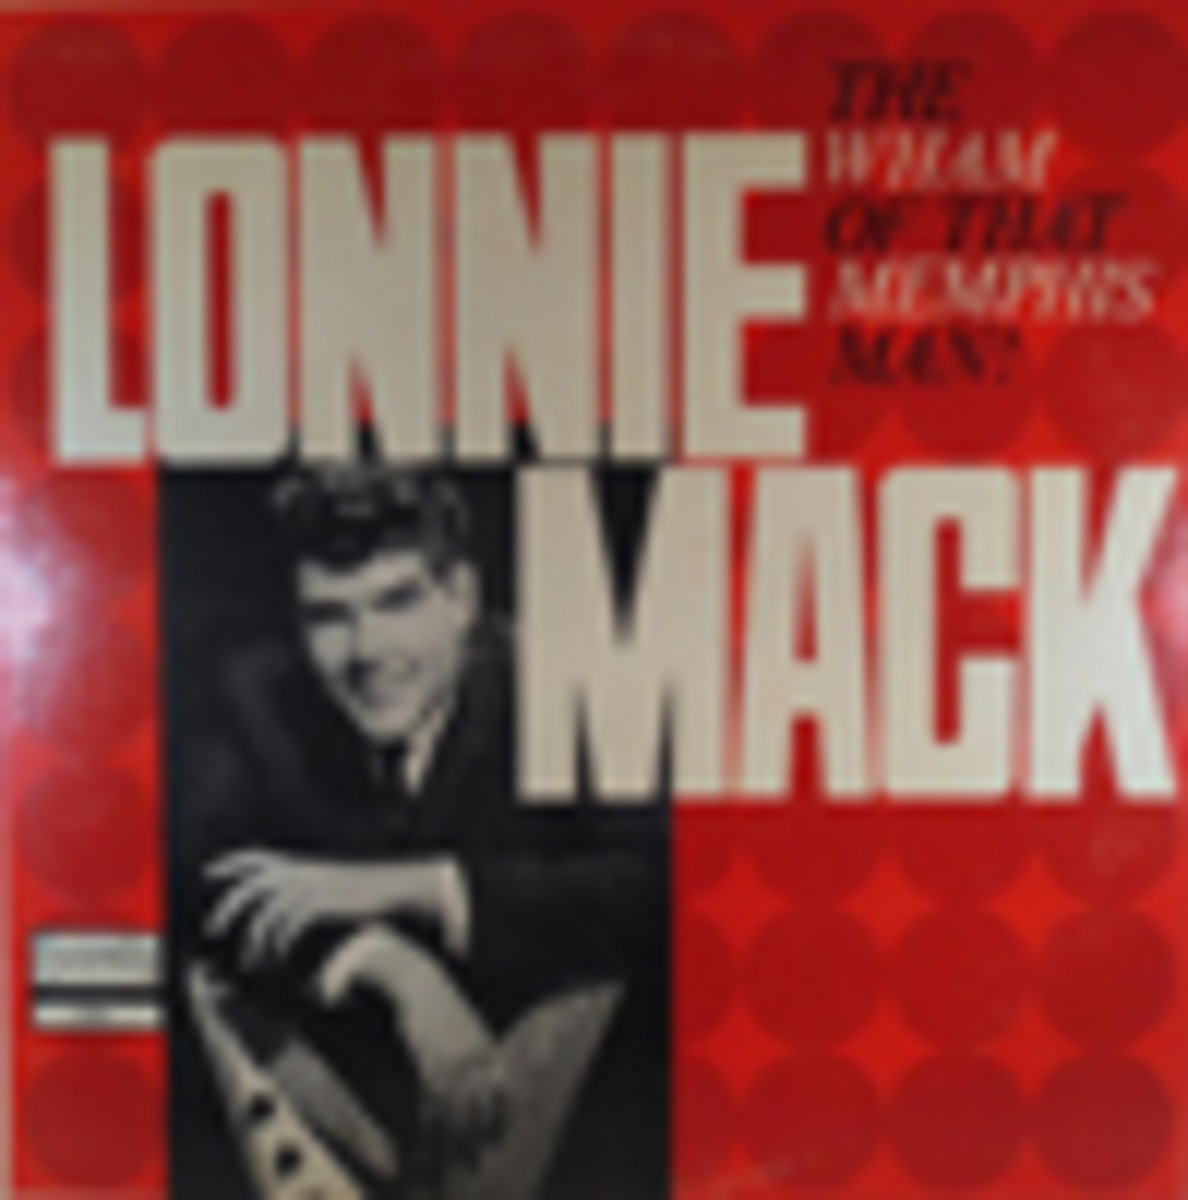 LonnieMack_MemphisWham